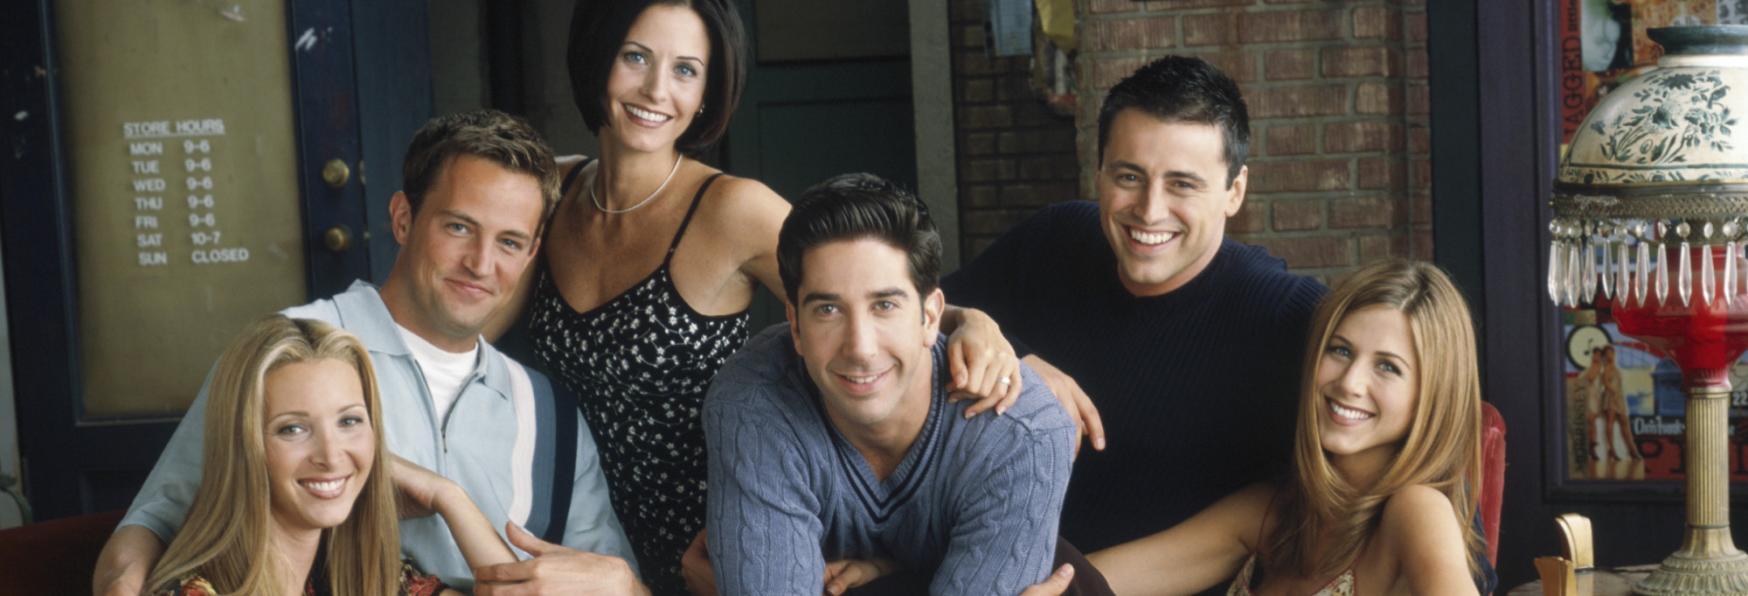 Friends: l'attesa Reunion è stata girata! Lo rivela Matt LeBlanc